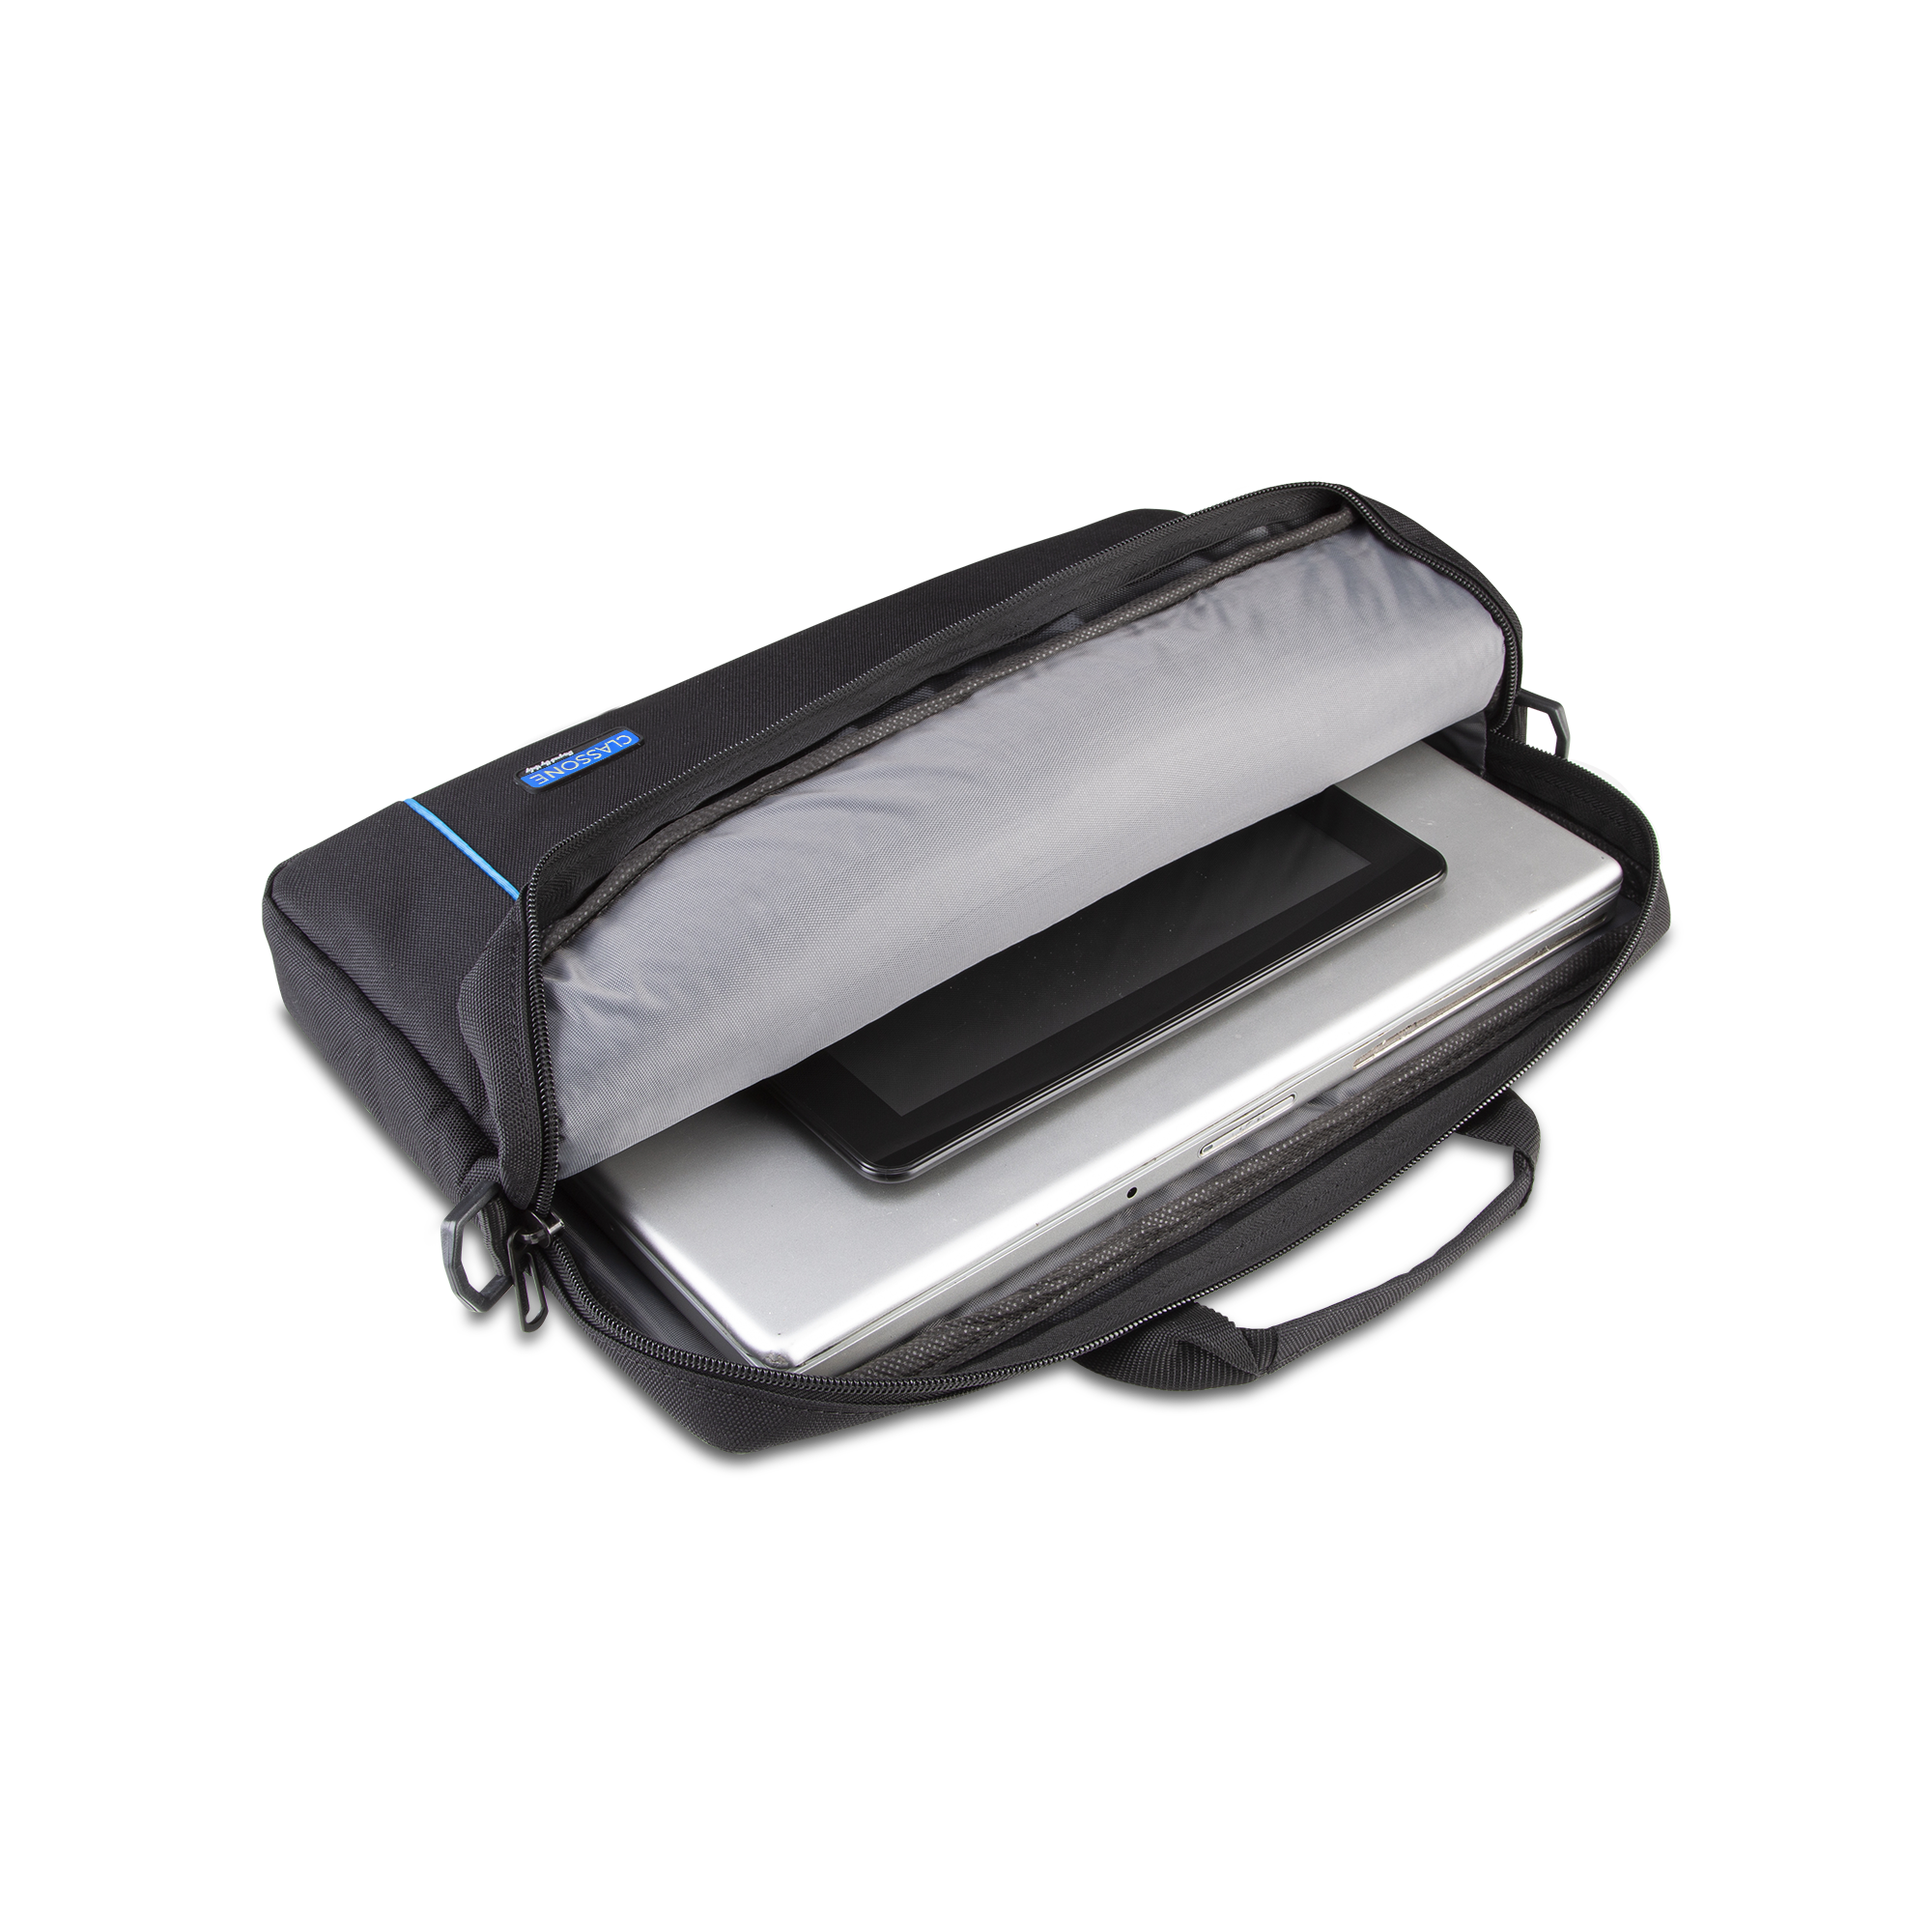 Classone BND700M WorkStation4 Serisi 15.6 inch Laptop, Notebook Çantası-Siyah/Mavi